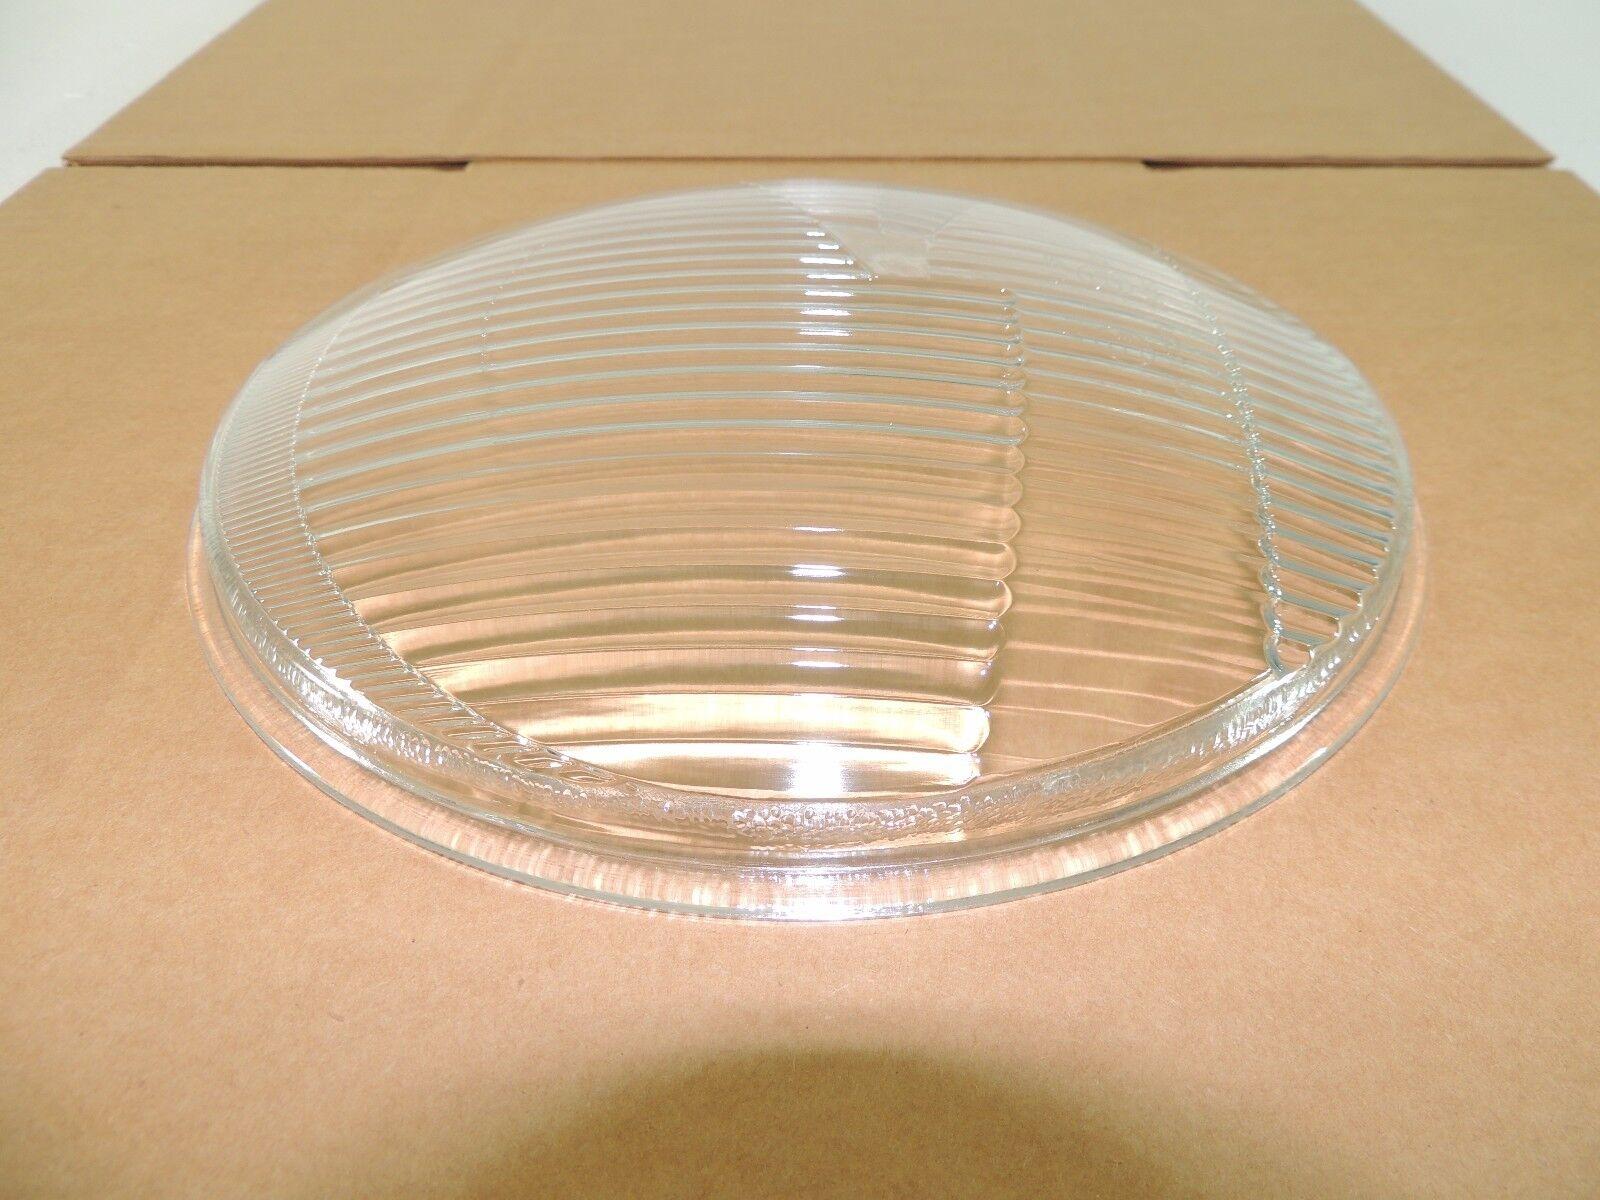 Headlight CLEAR Lens Replaces For 1950-1967 50-67 Porsche 356 911 912